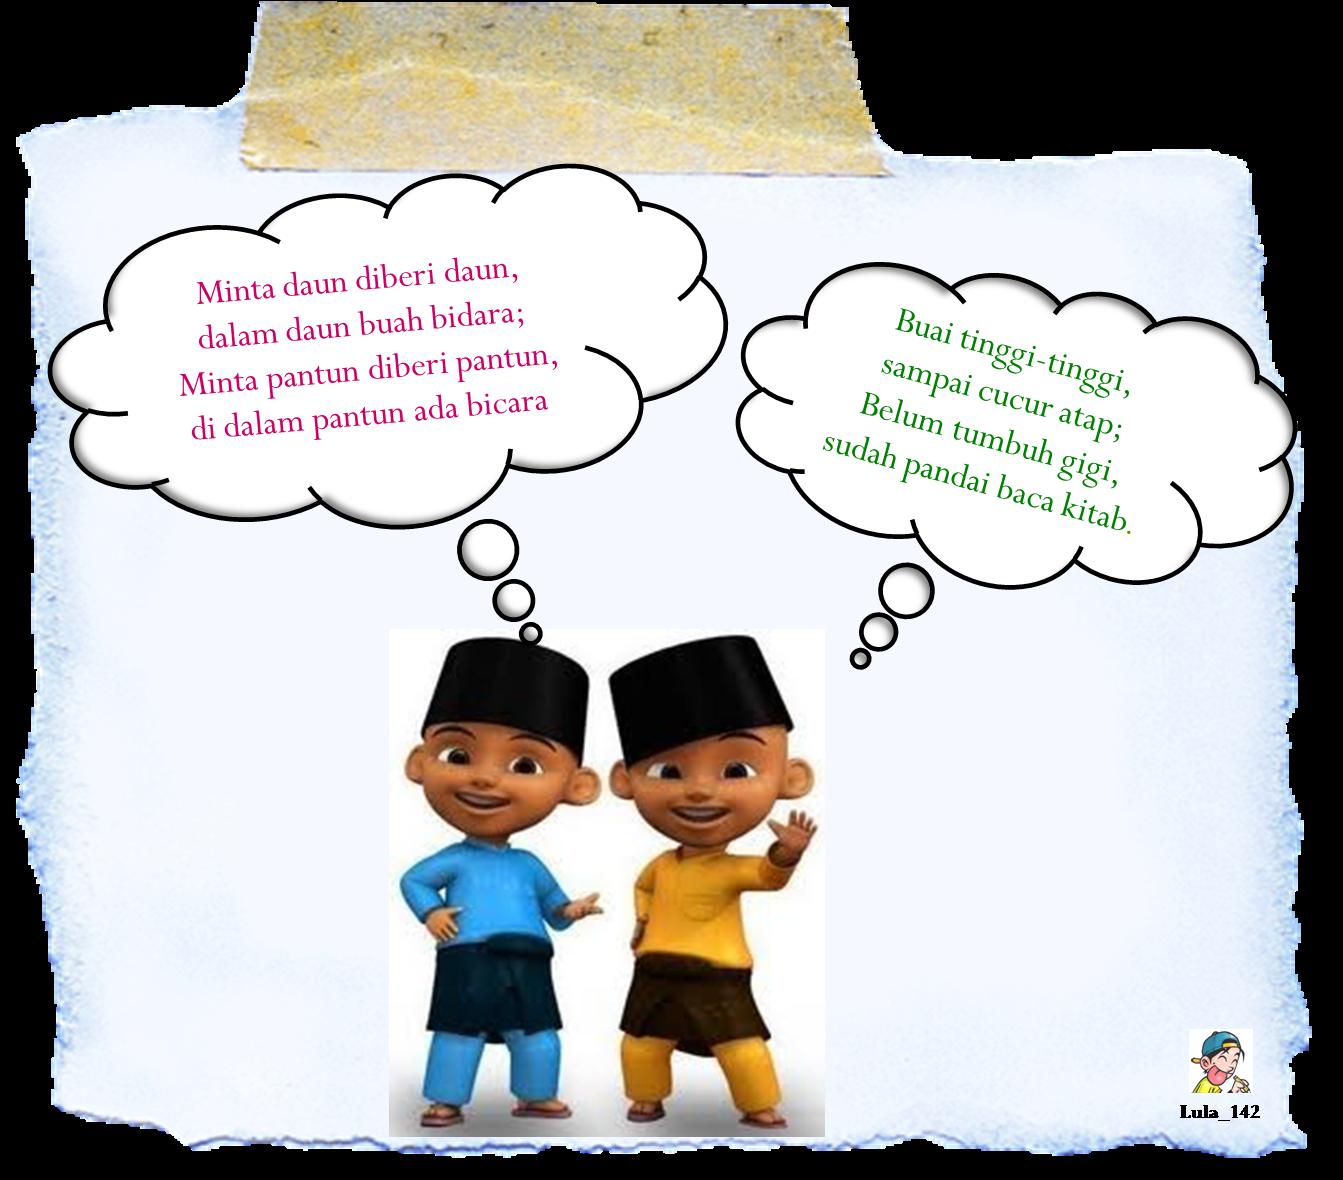 Lakaran Citra Bahasa Tak Lapuk Dek Hujan Tak Lekang Dek Panas